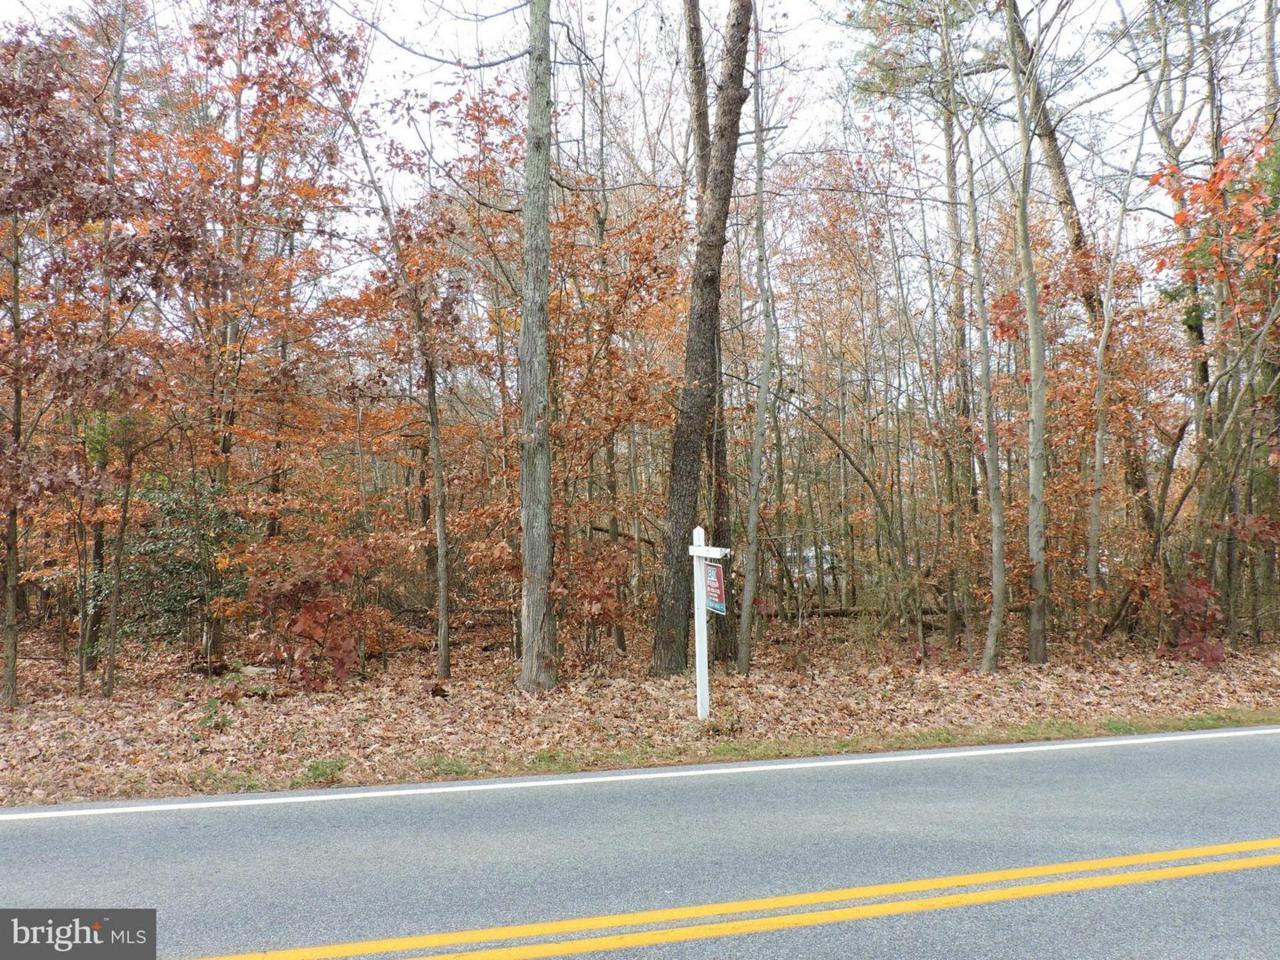 0 Bumpy Oak Road - Photo 1